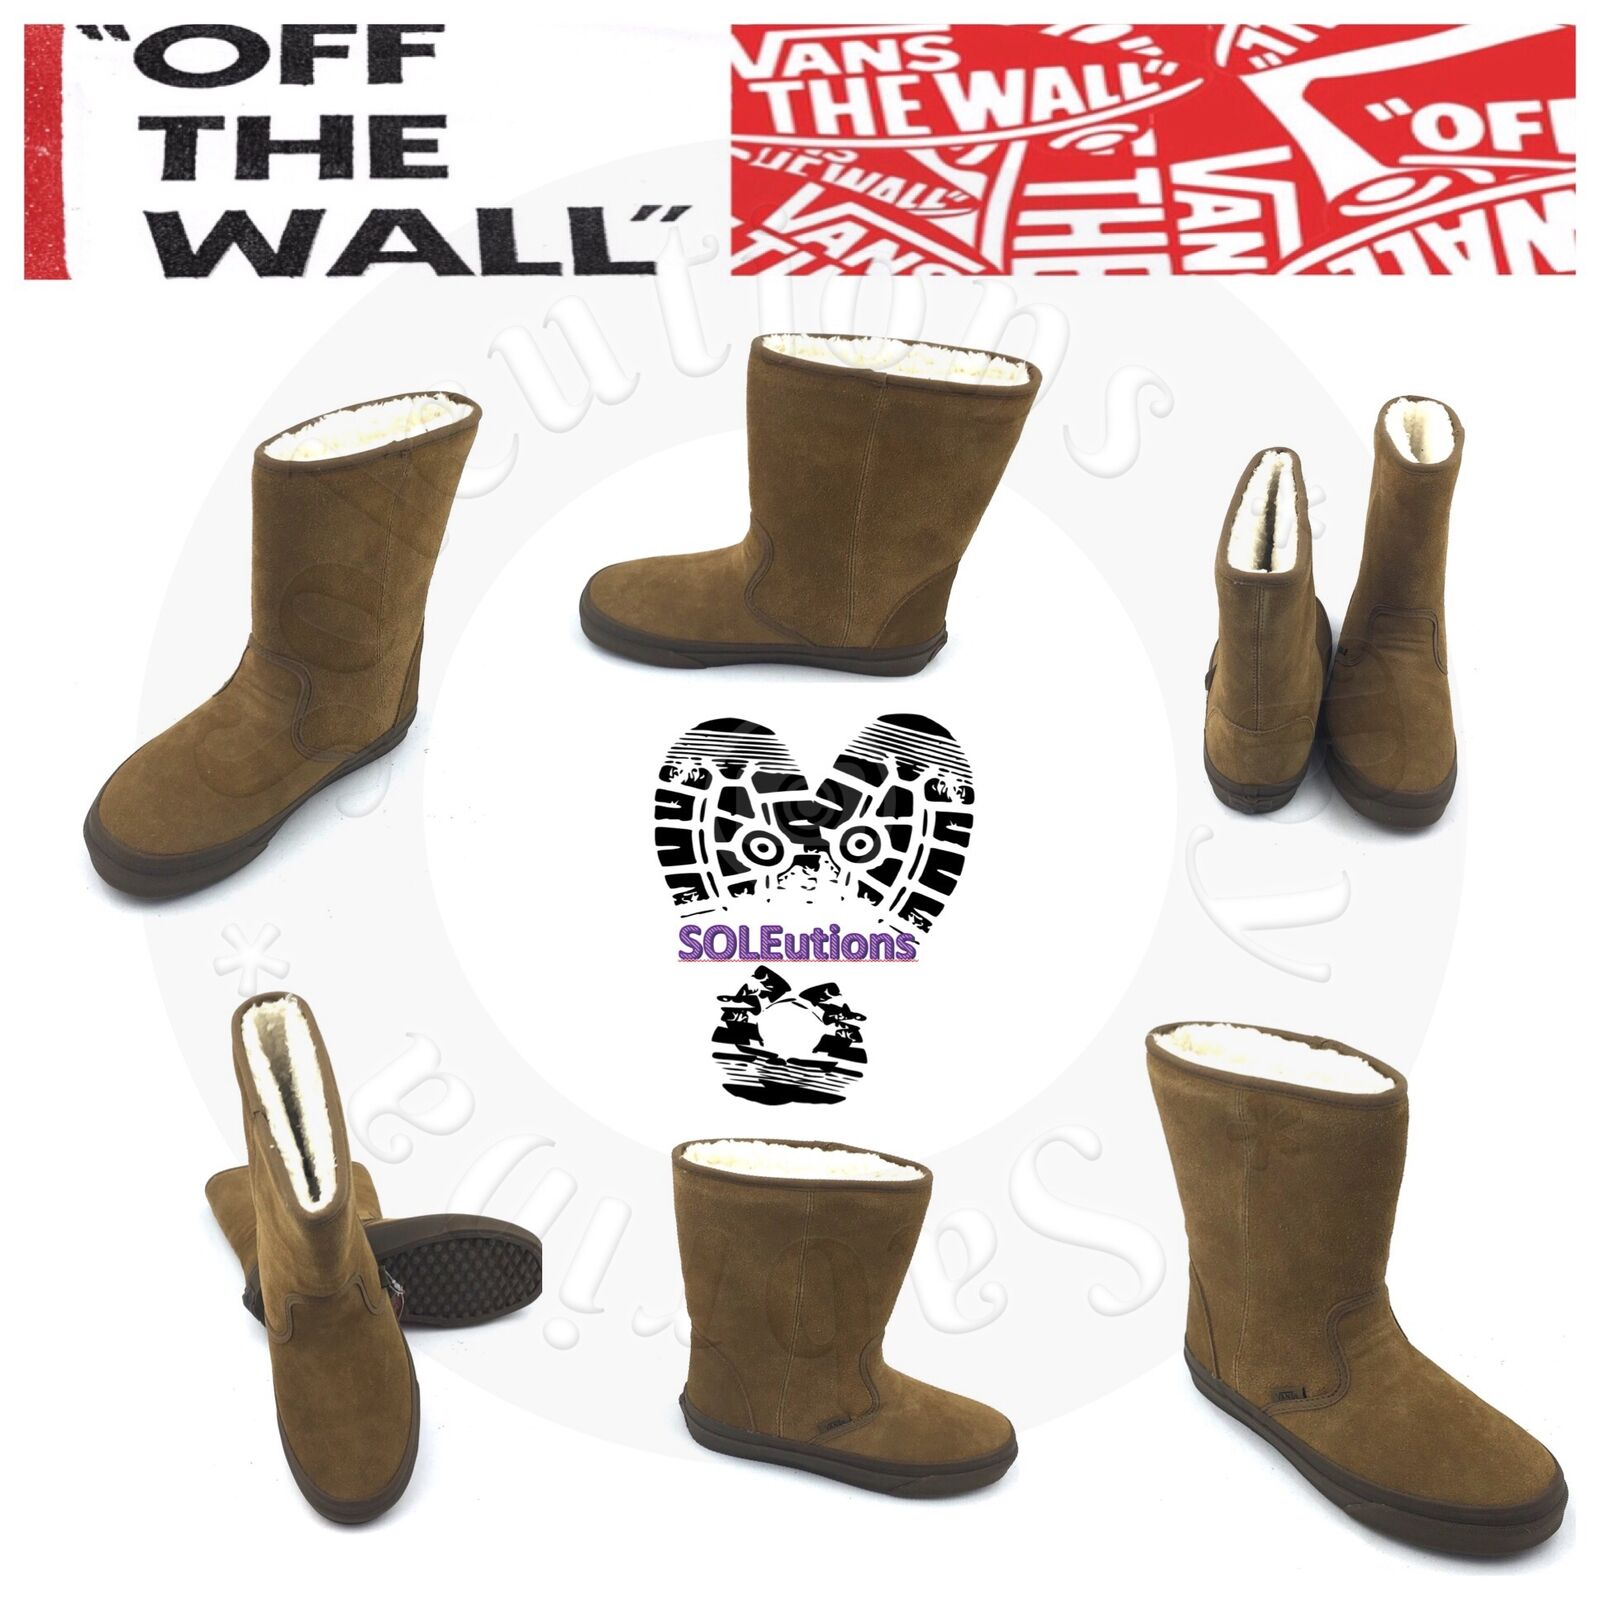 Vans Gum Slip-on Boot (Suede) Ermine/Dark Gum Vans W10.5 5c8539